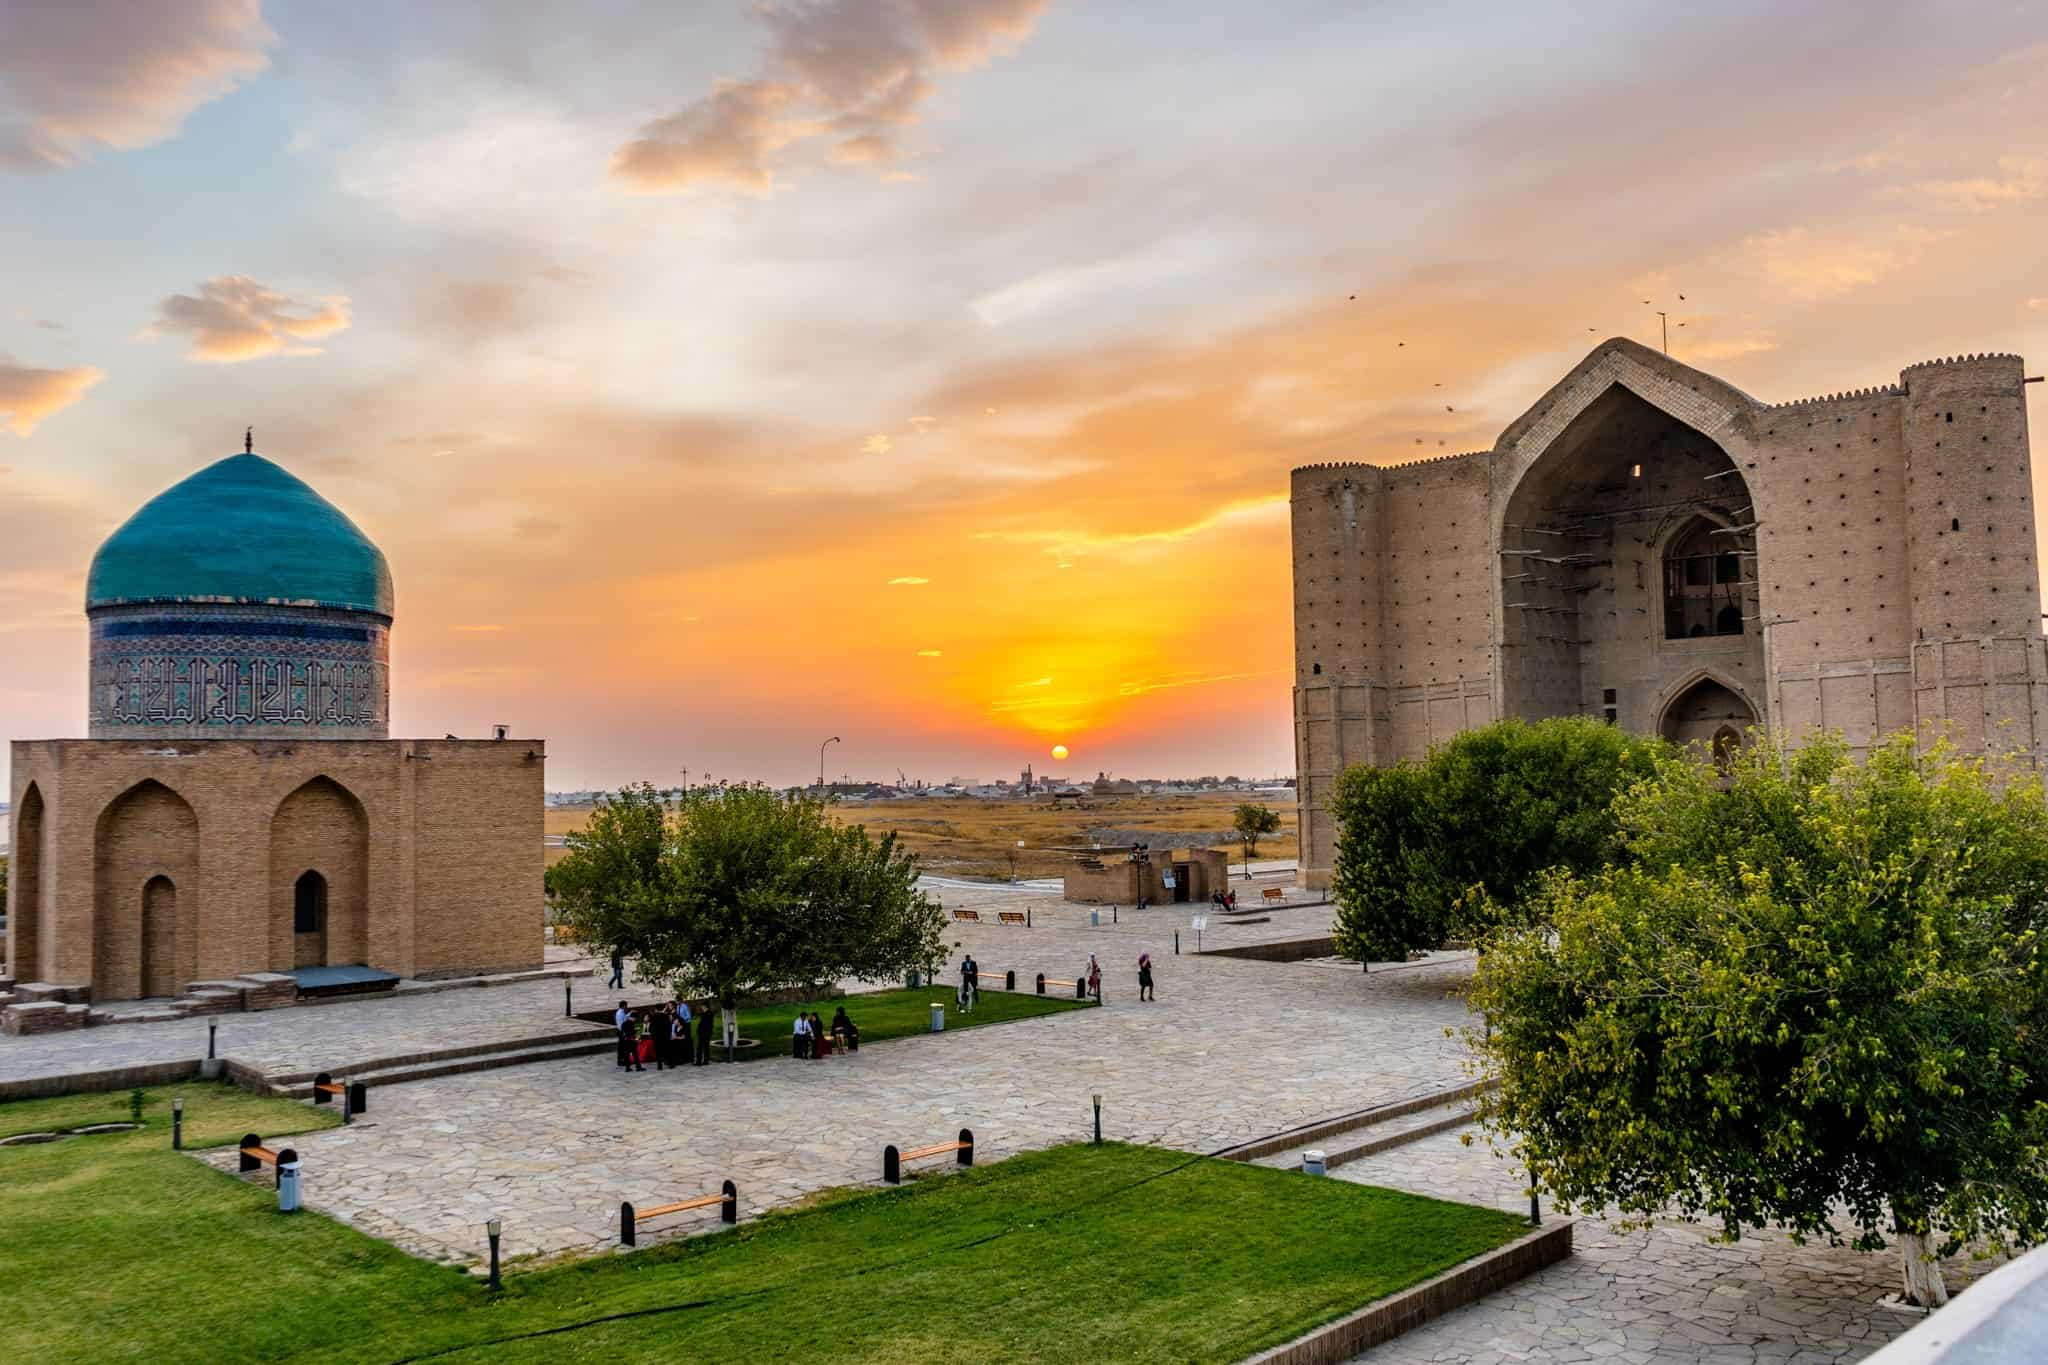 Sunset the Mausoleum of Khawaja Ahmed Yasawi Turkistan